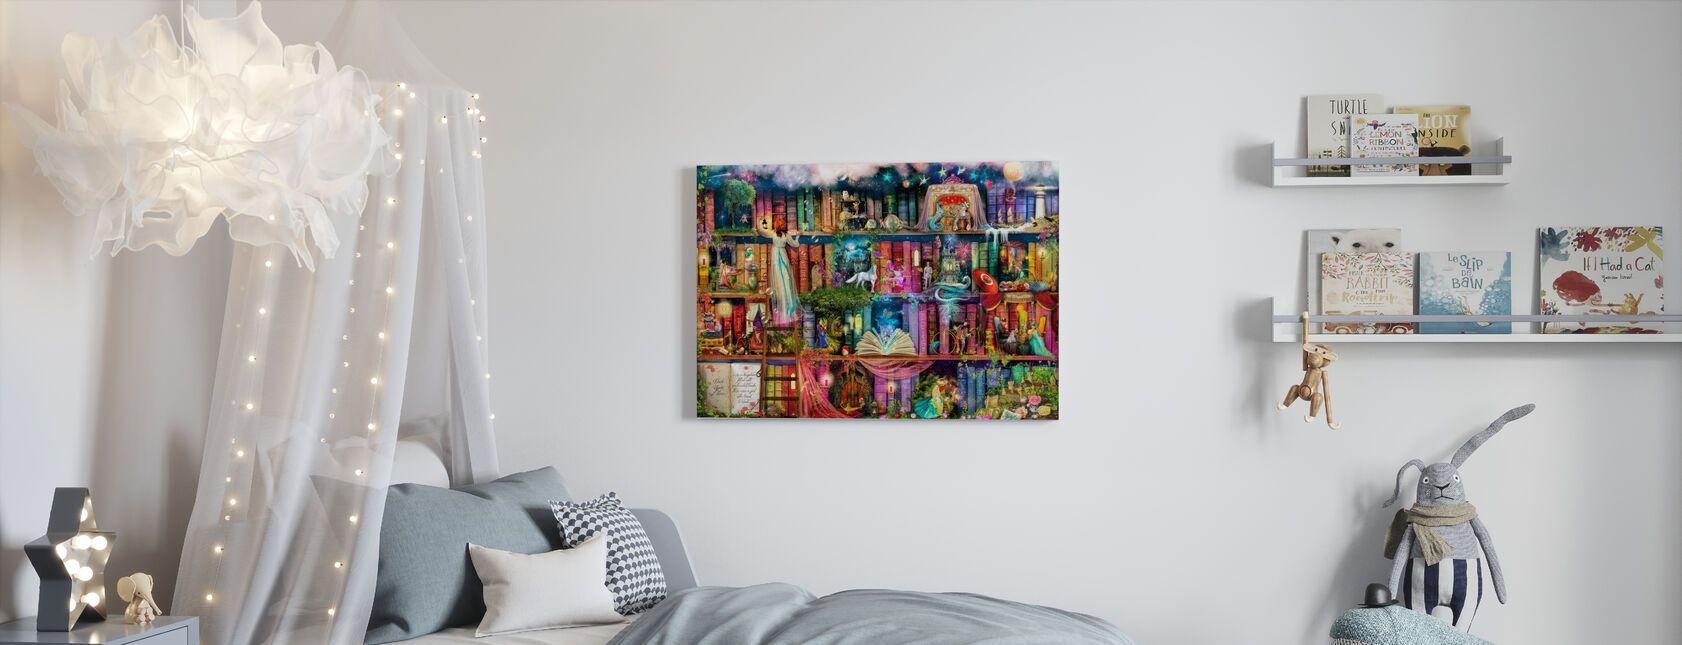 Schattenjacht boek plank - Canvas print - Kinderkamer